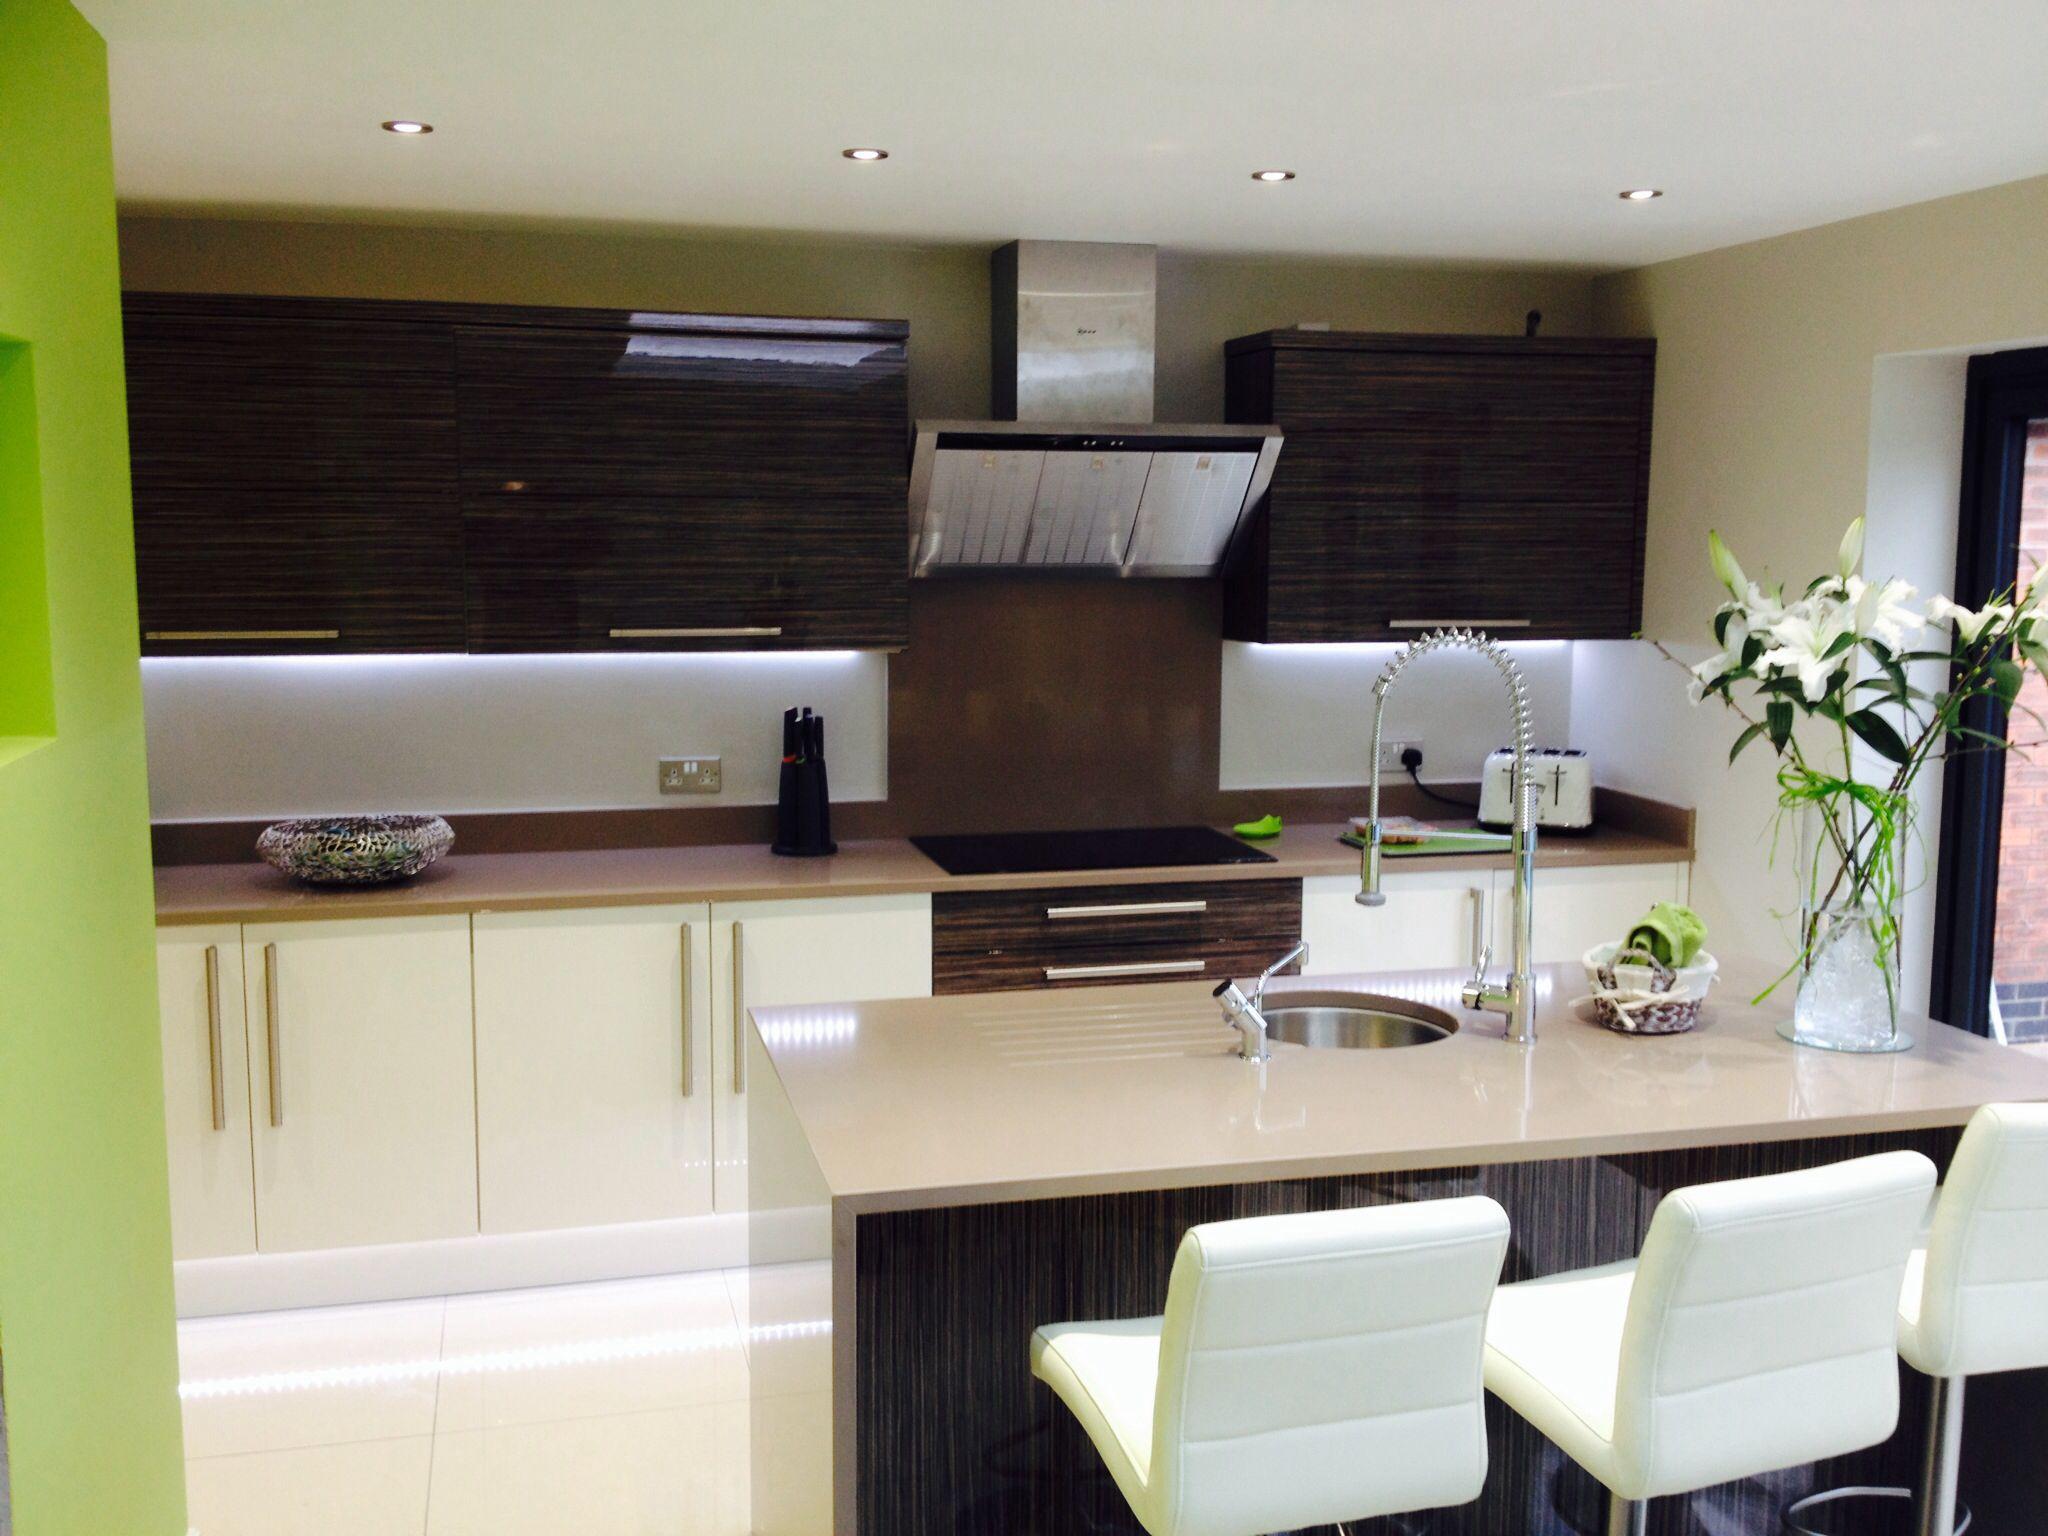 #Rpod195 #podlife | Home decor, Home, Kitchen cabinets